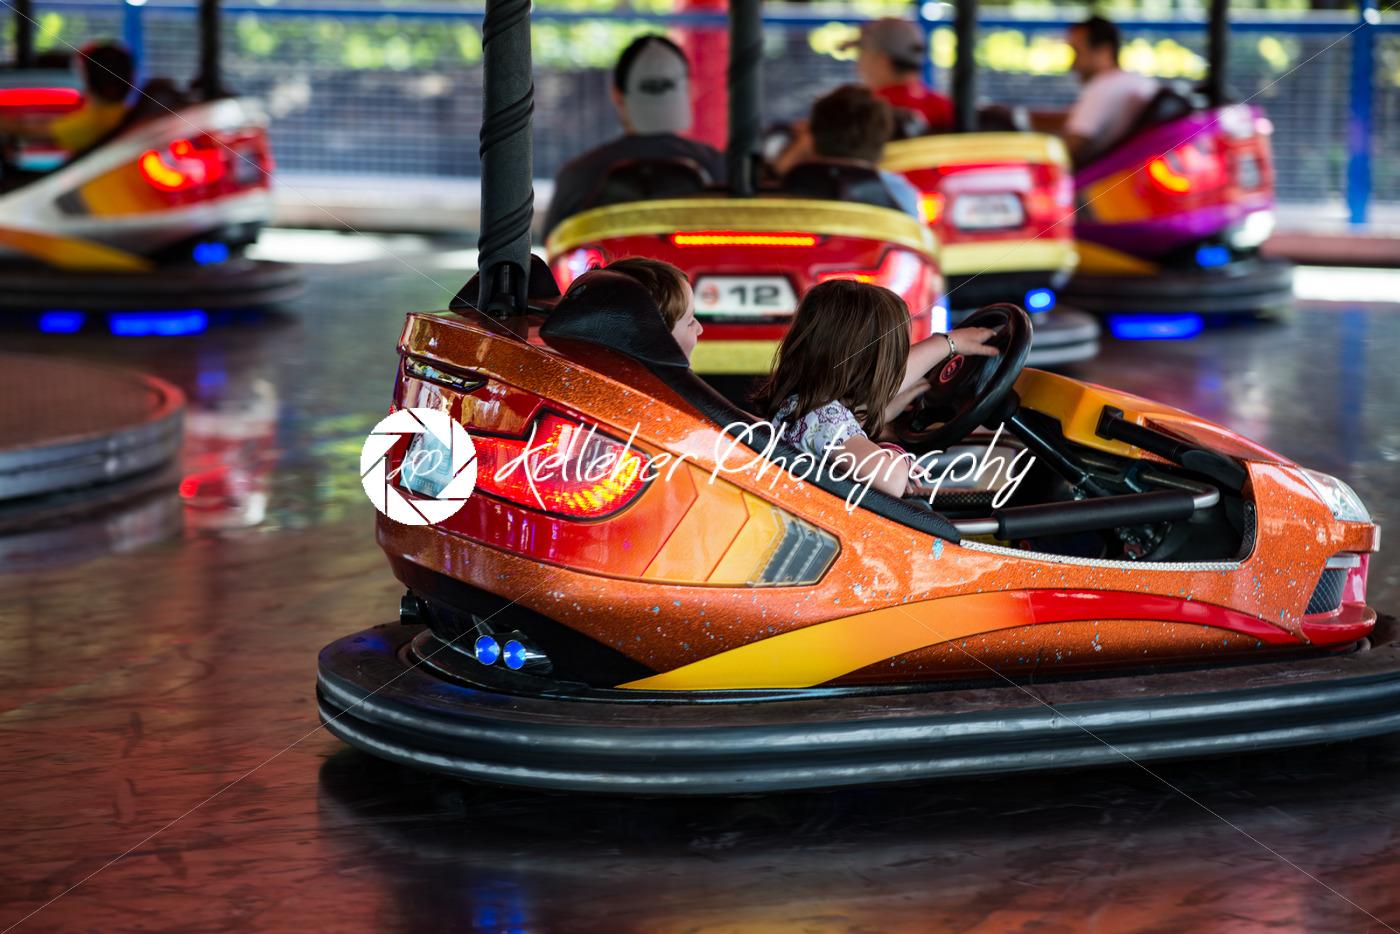 ALLENTOWN, PA – OCTOBER 22: Bumper Cars at Dorney Park in Allentown, Pennsylvania - Kelleher Photography Store